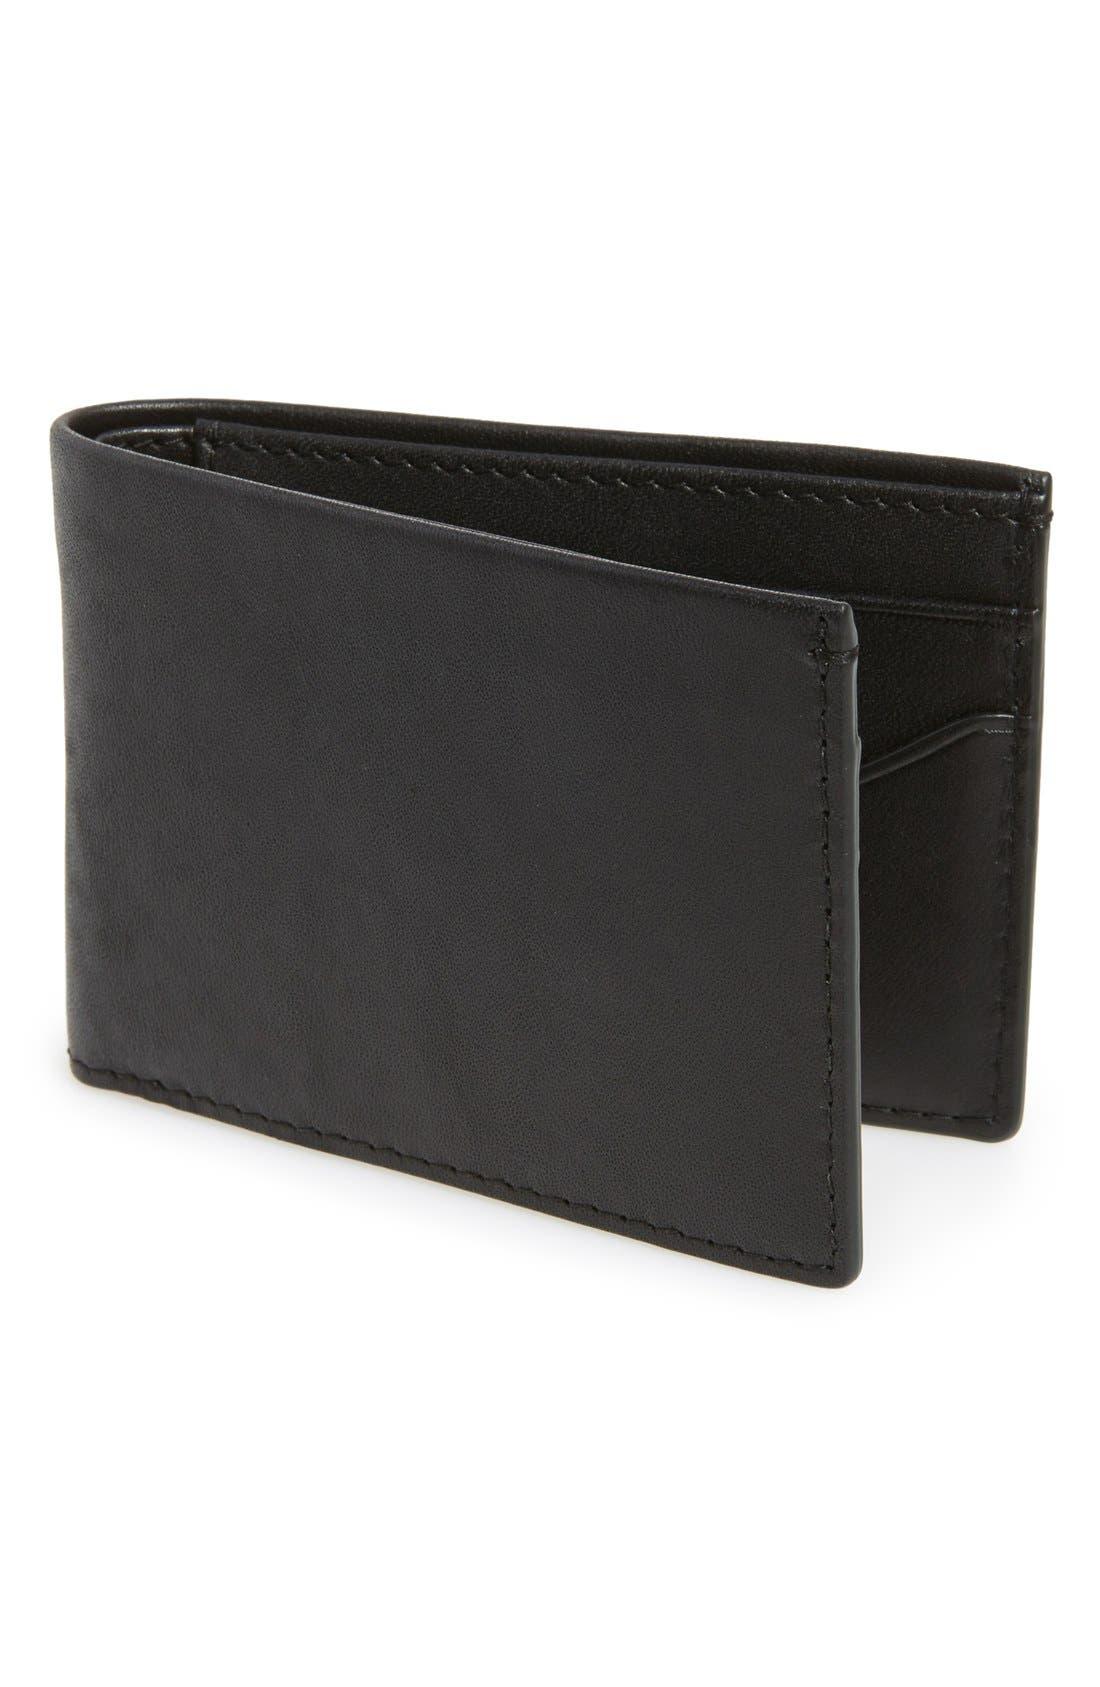 Main Image - Skagen'Ambold' Leather Wallet